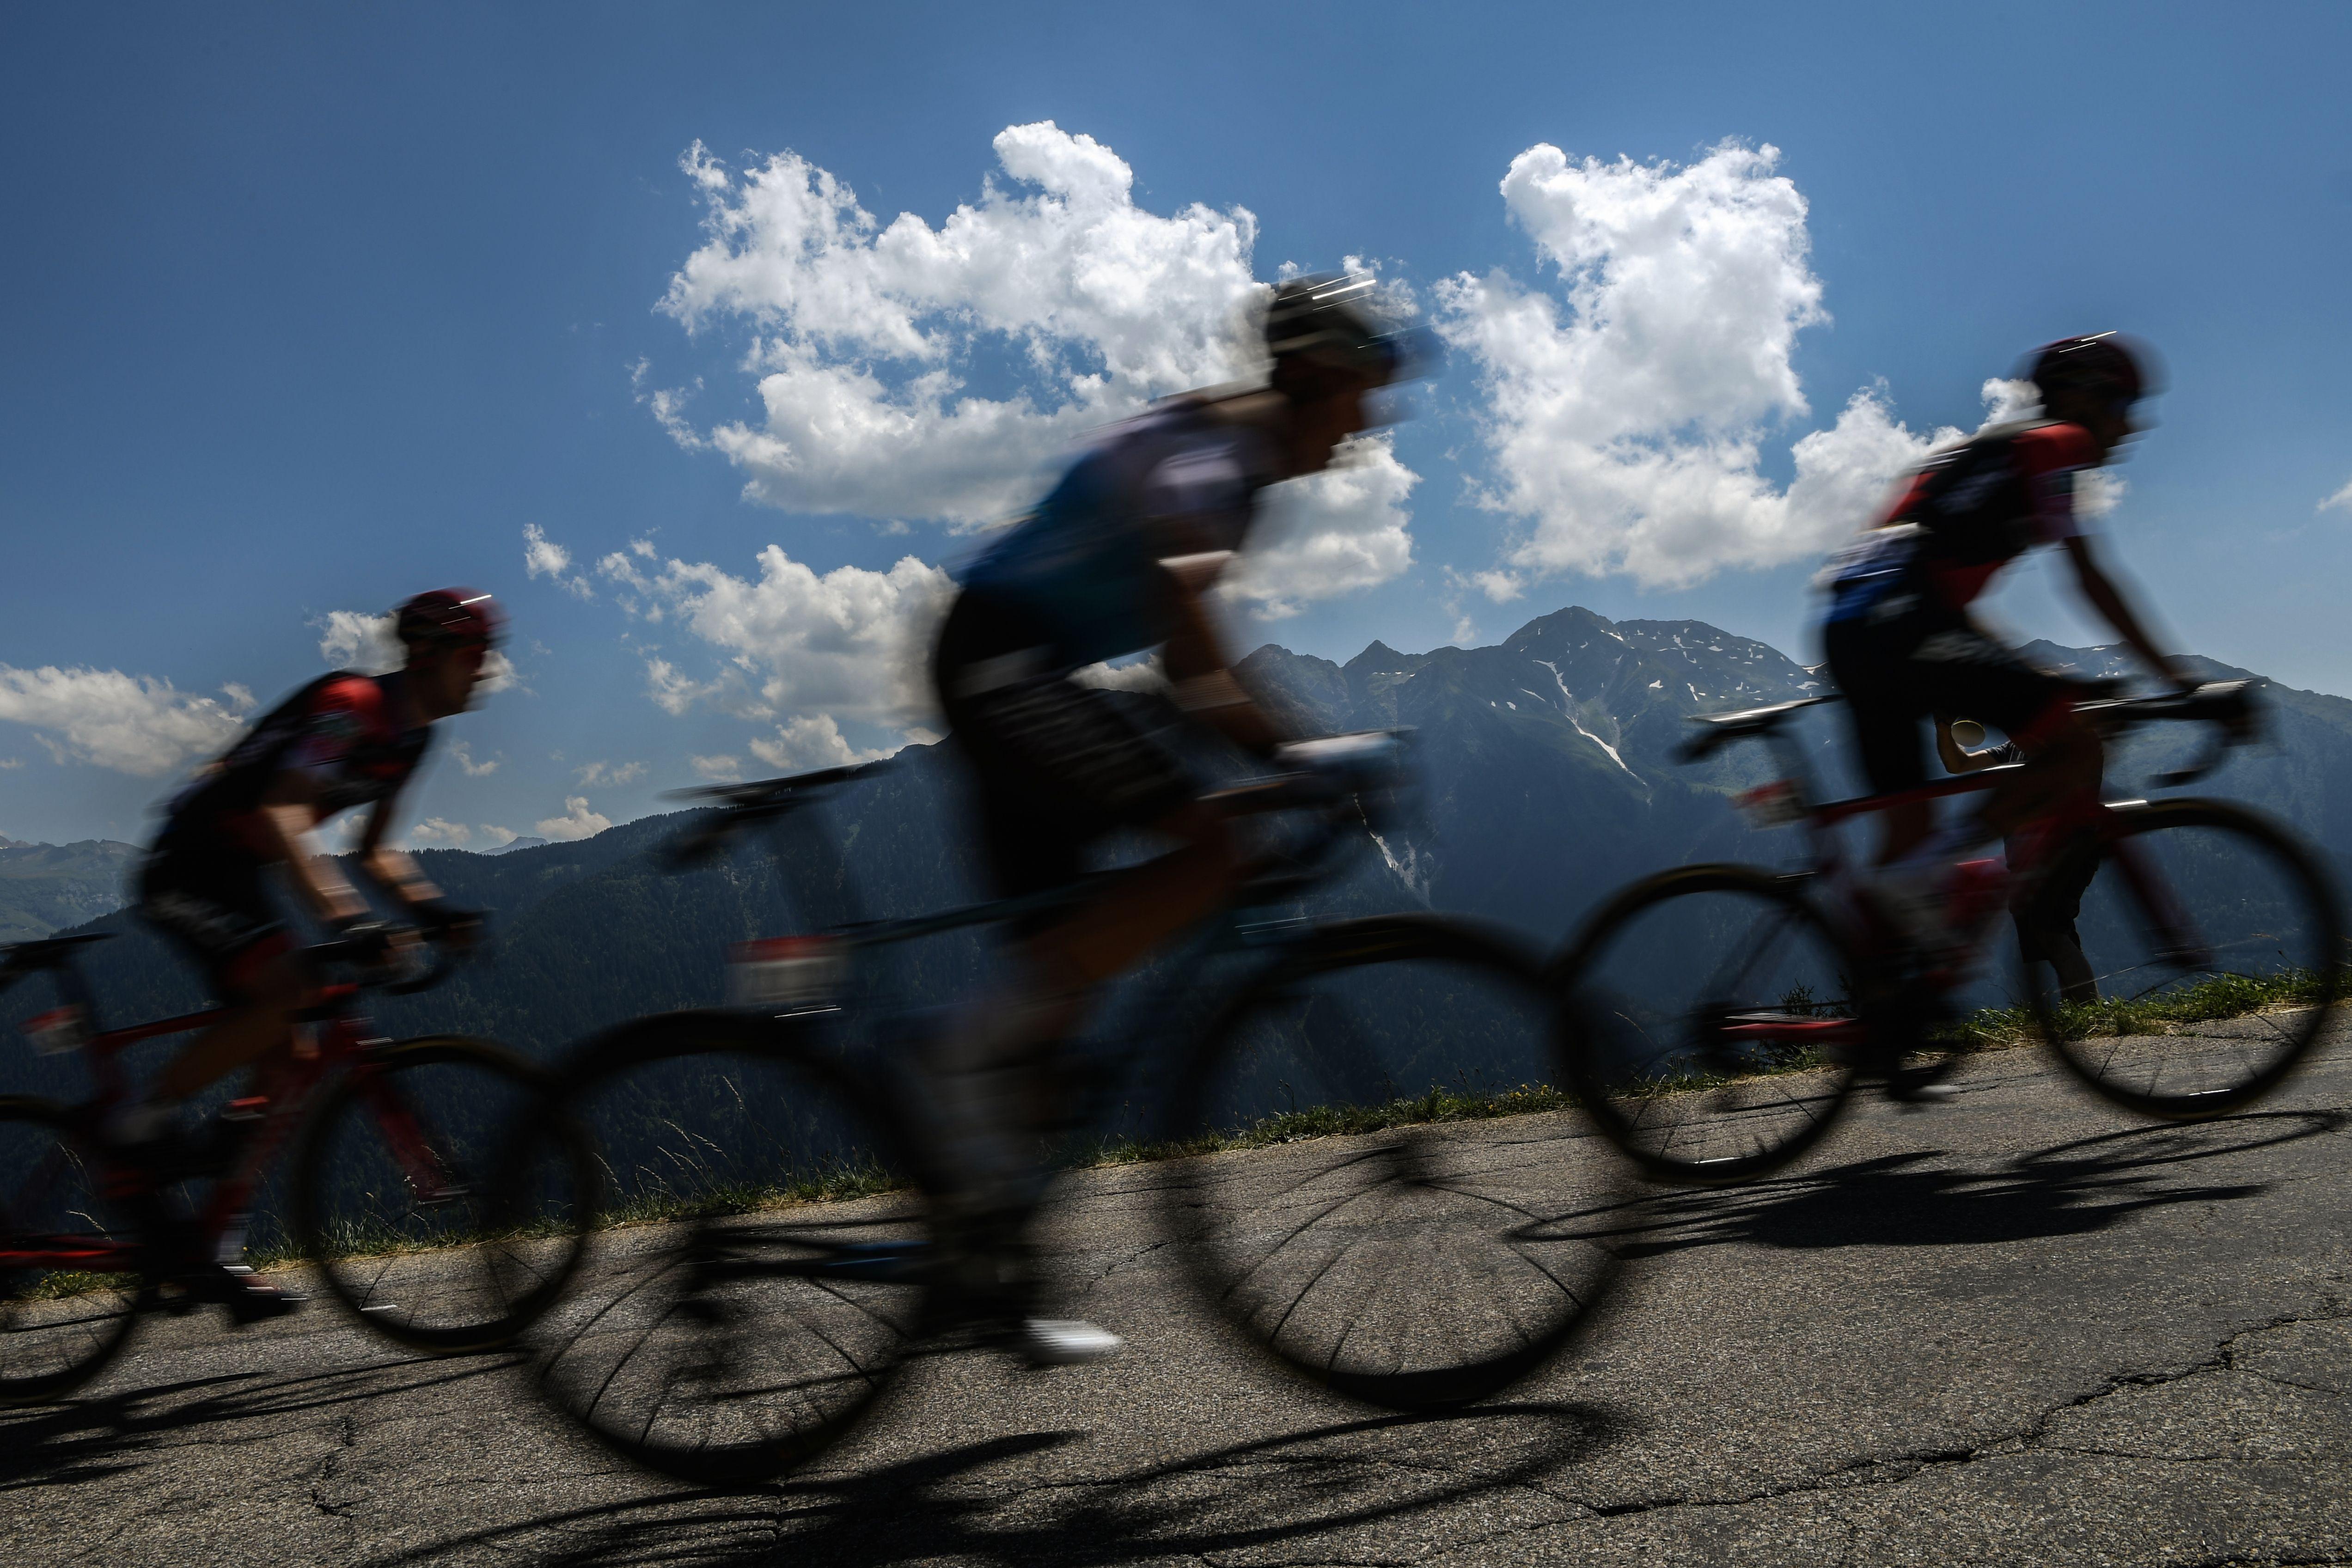 Tour de France 2019 Stages - Tour de France Stages You Must Watch 316265b6d